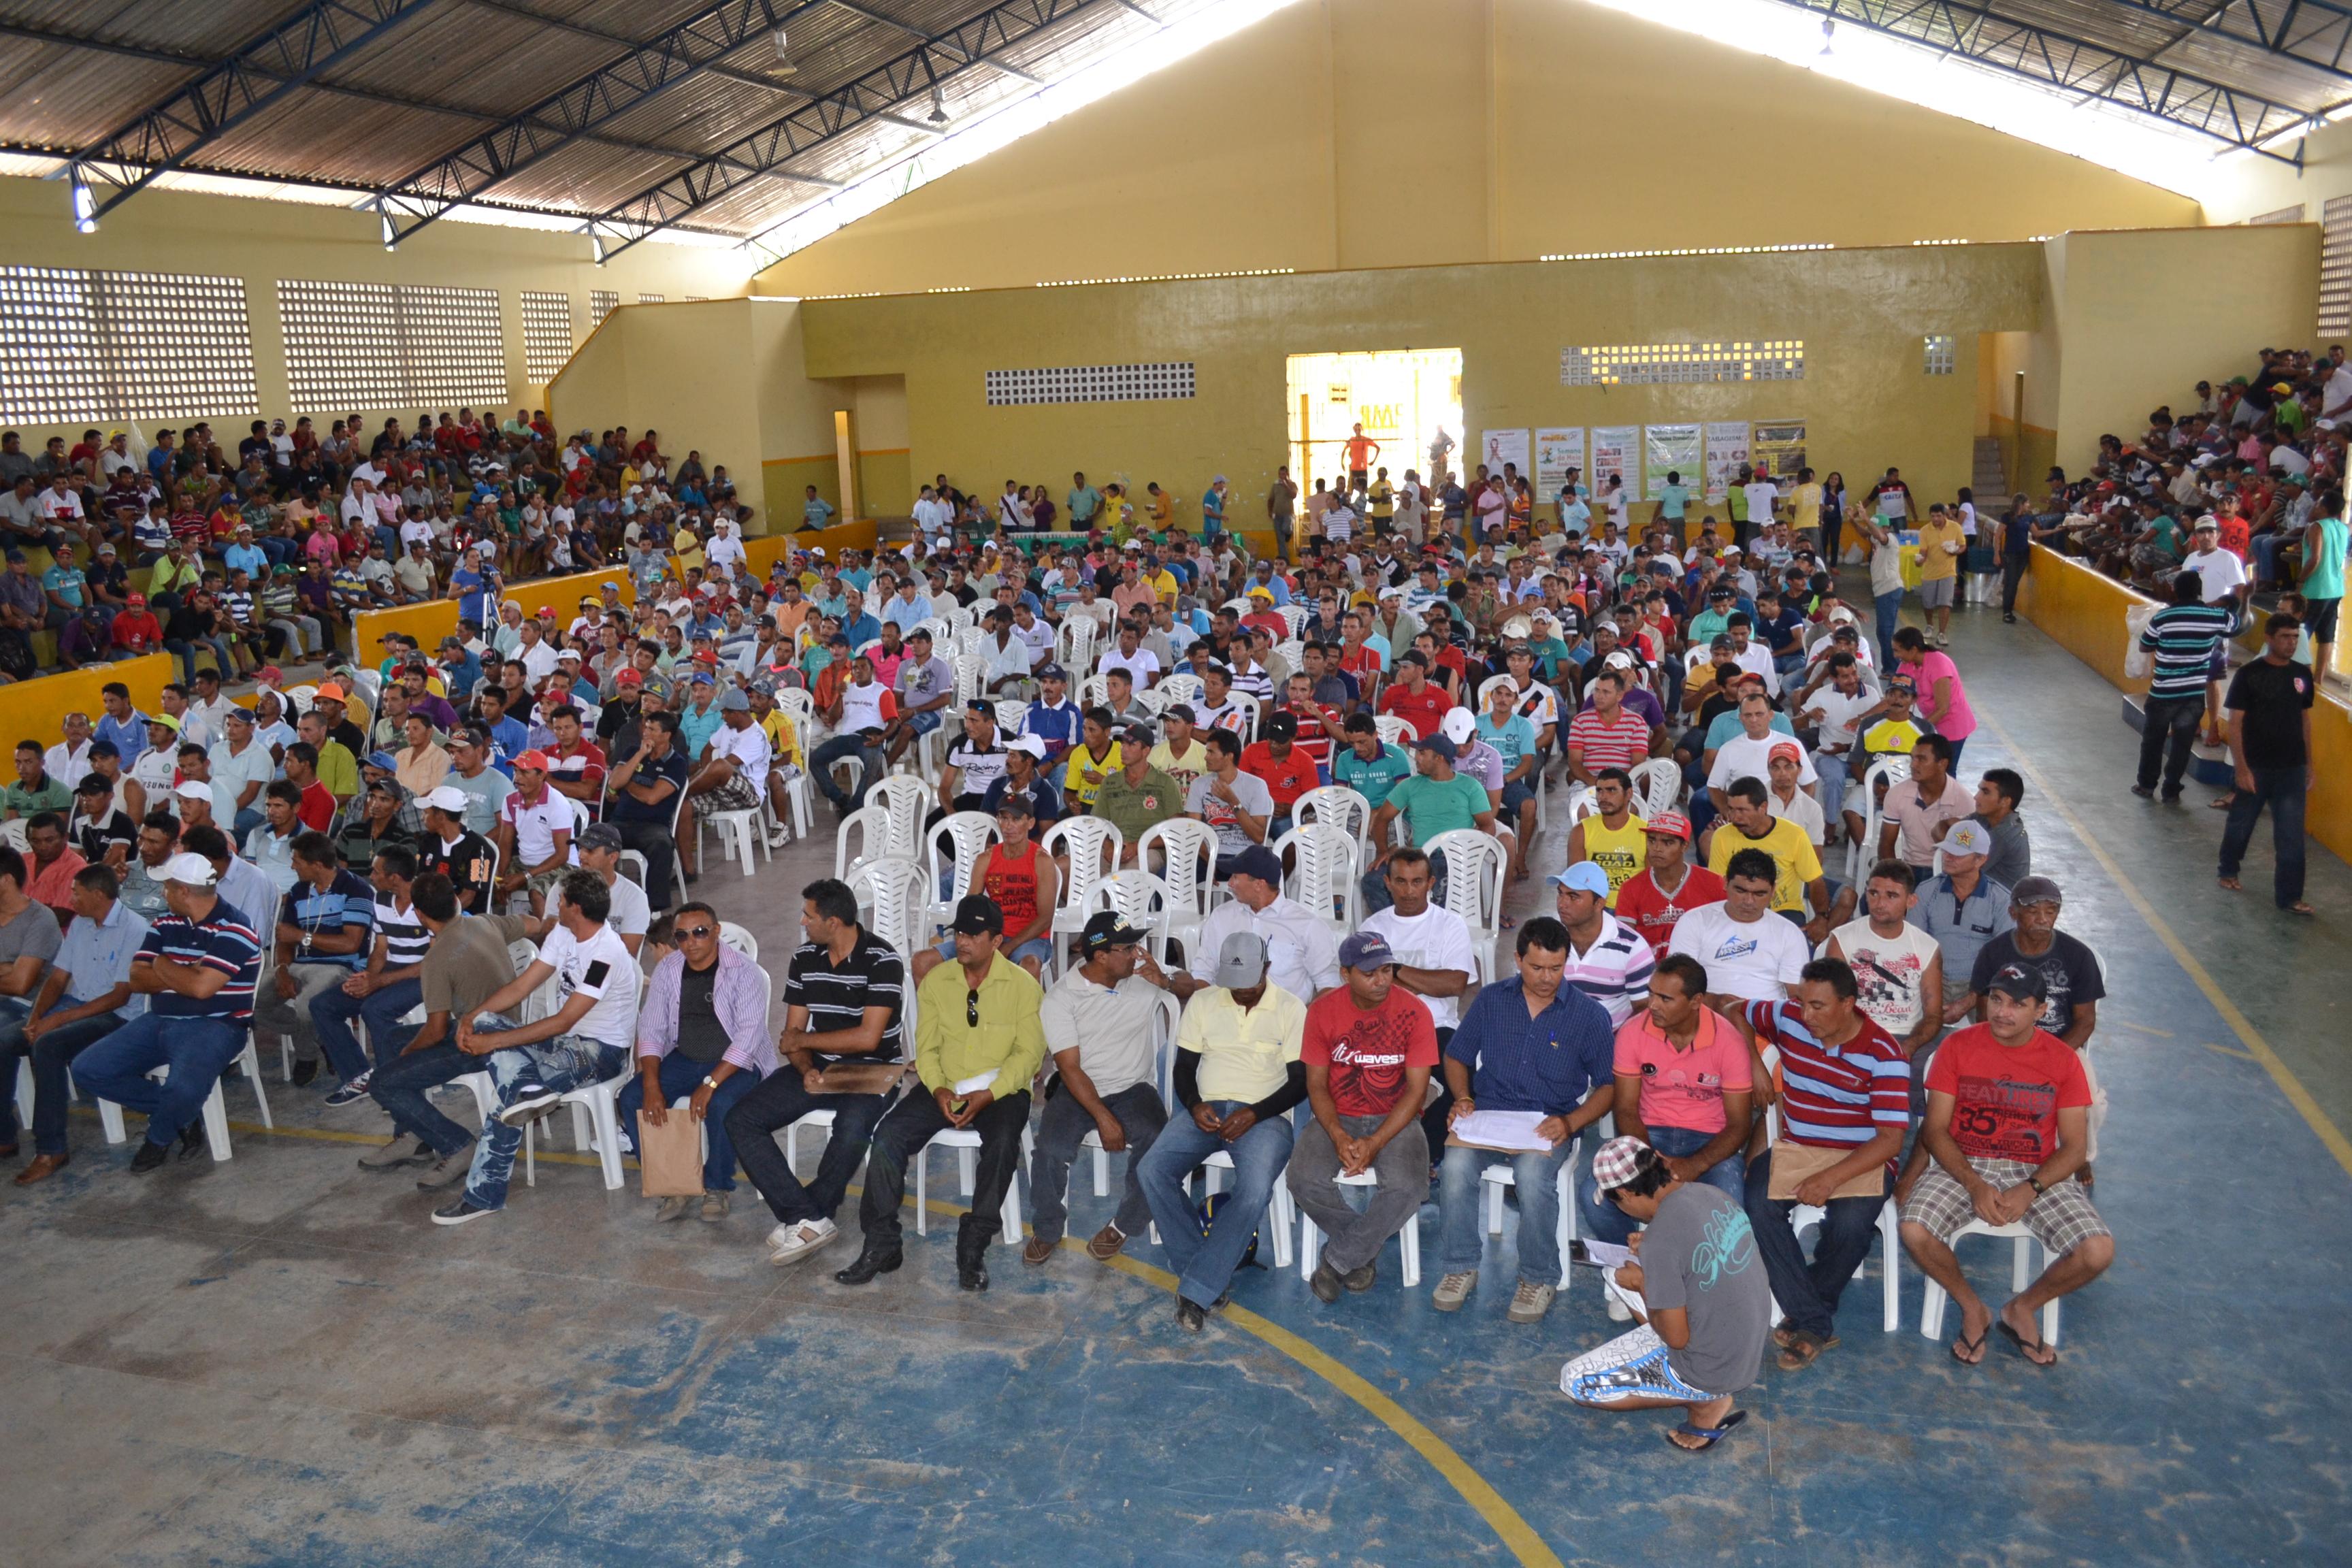 Capacitando os colaboradores do Açúcar Alegre para a Safra 2014/2015